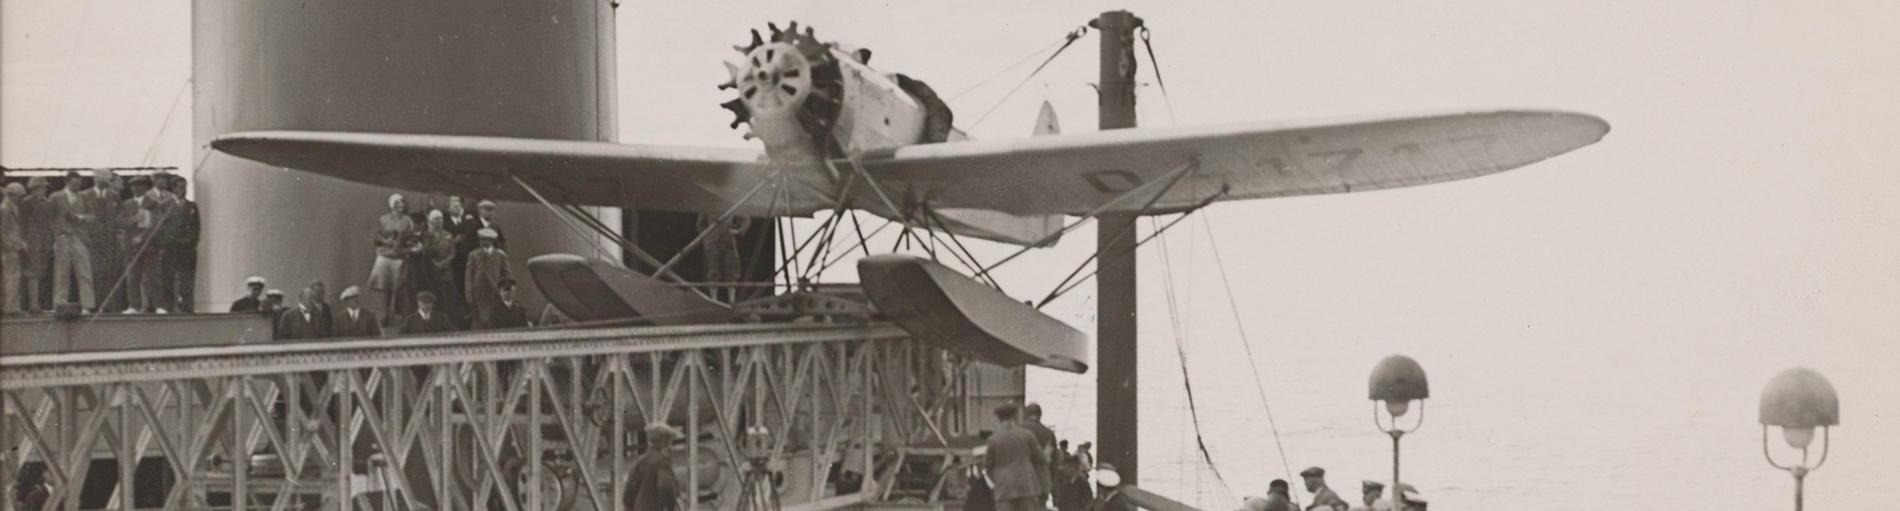 Experiment Moderne. Bremen nach 1918 - Ausstellung im Focke Museum